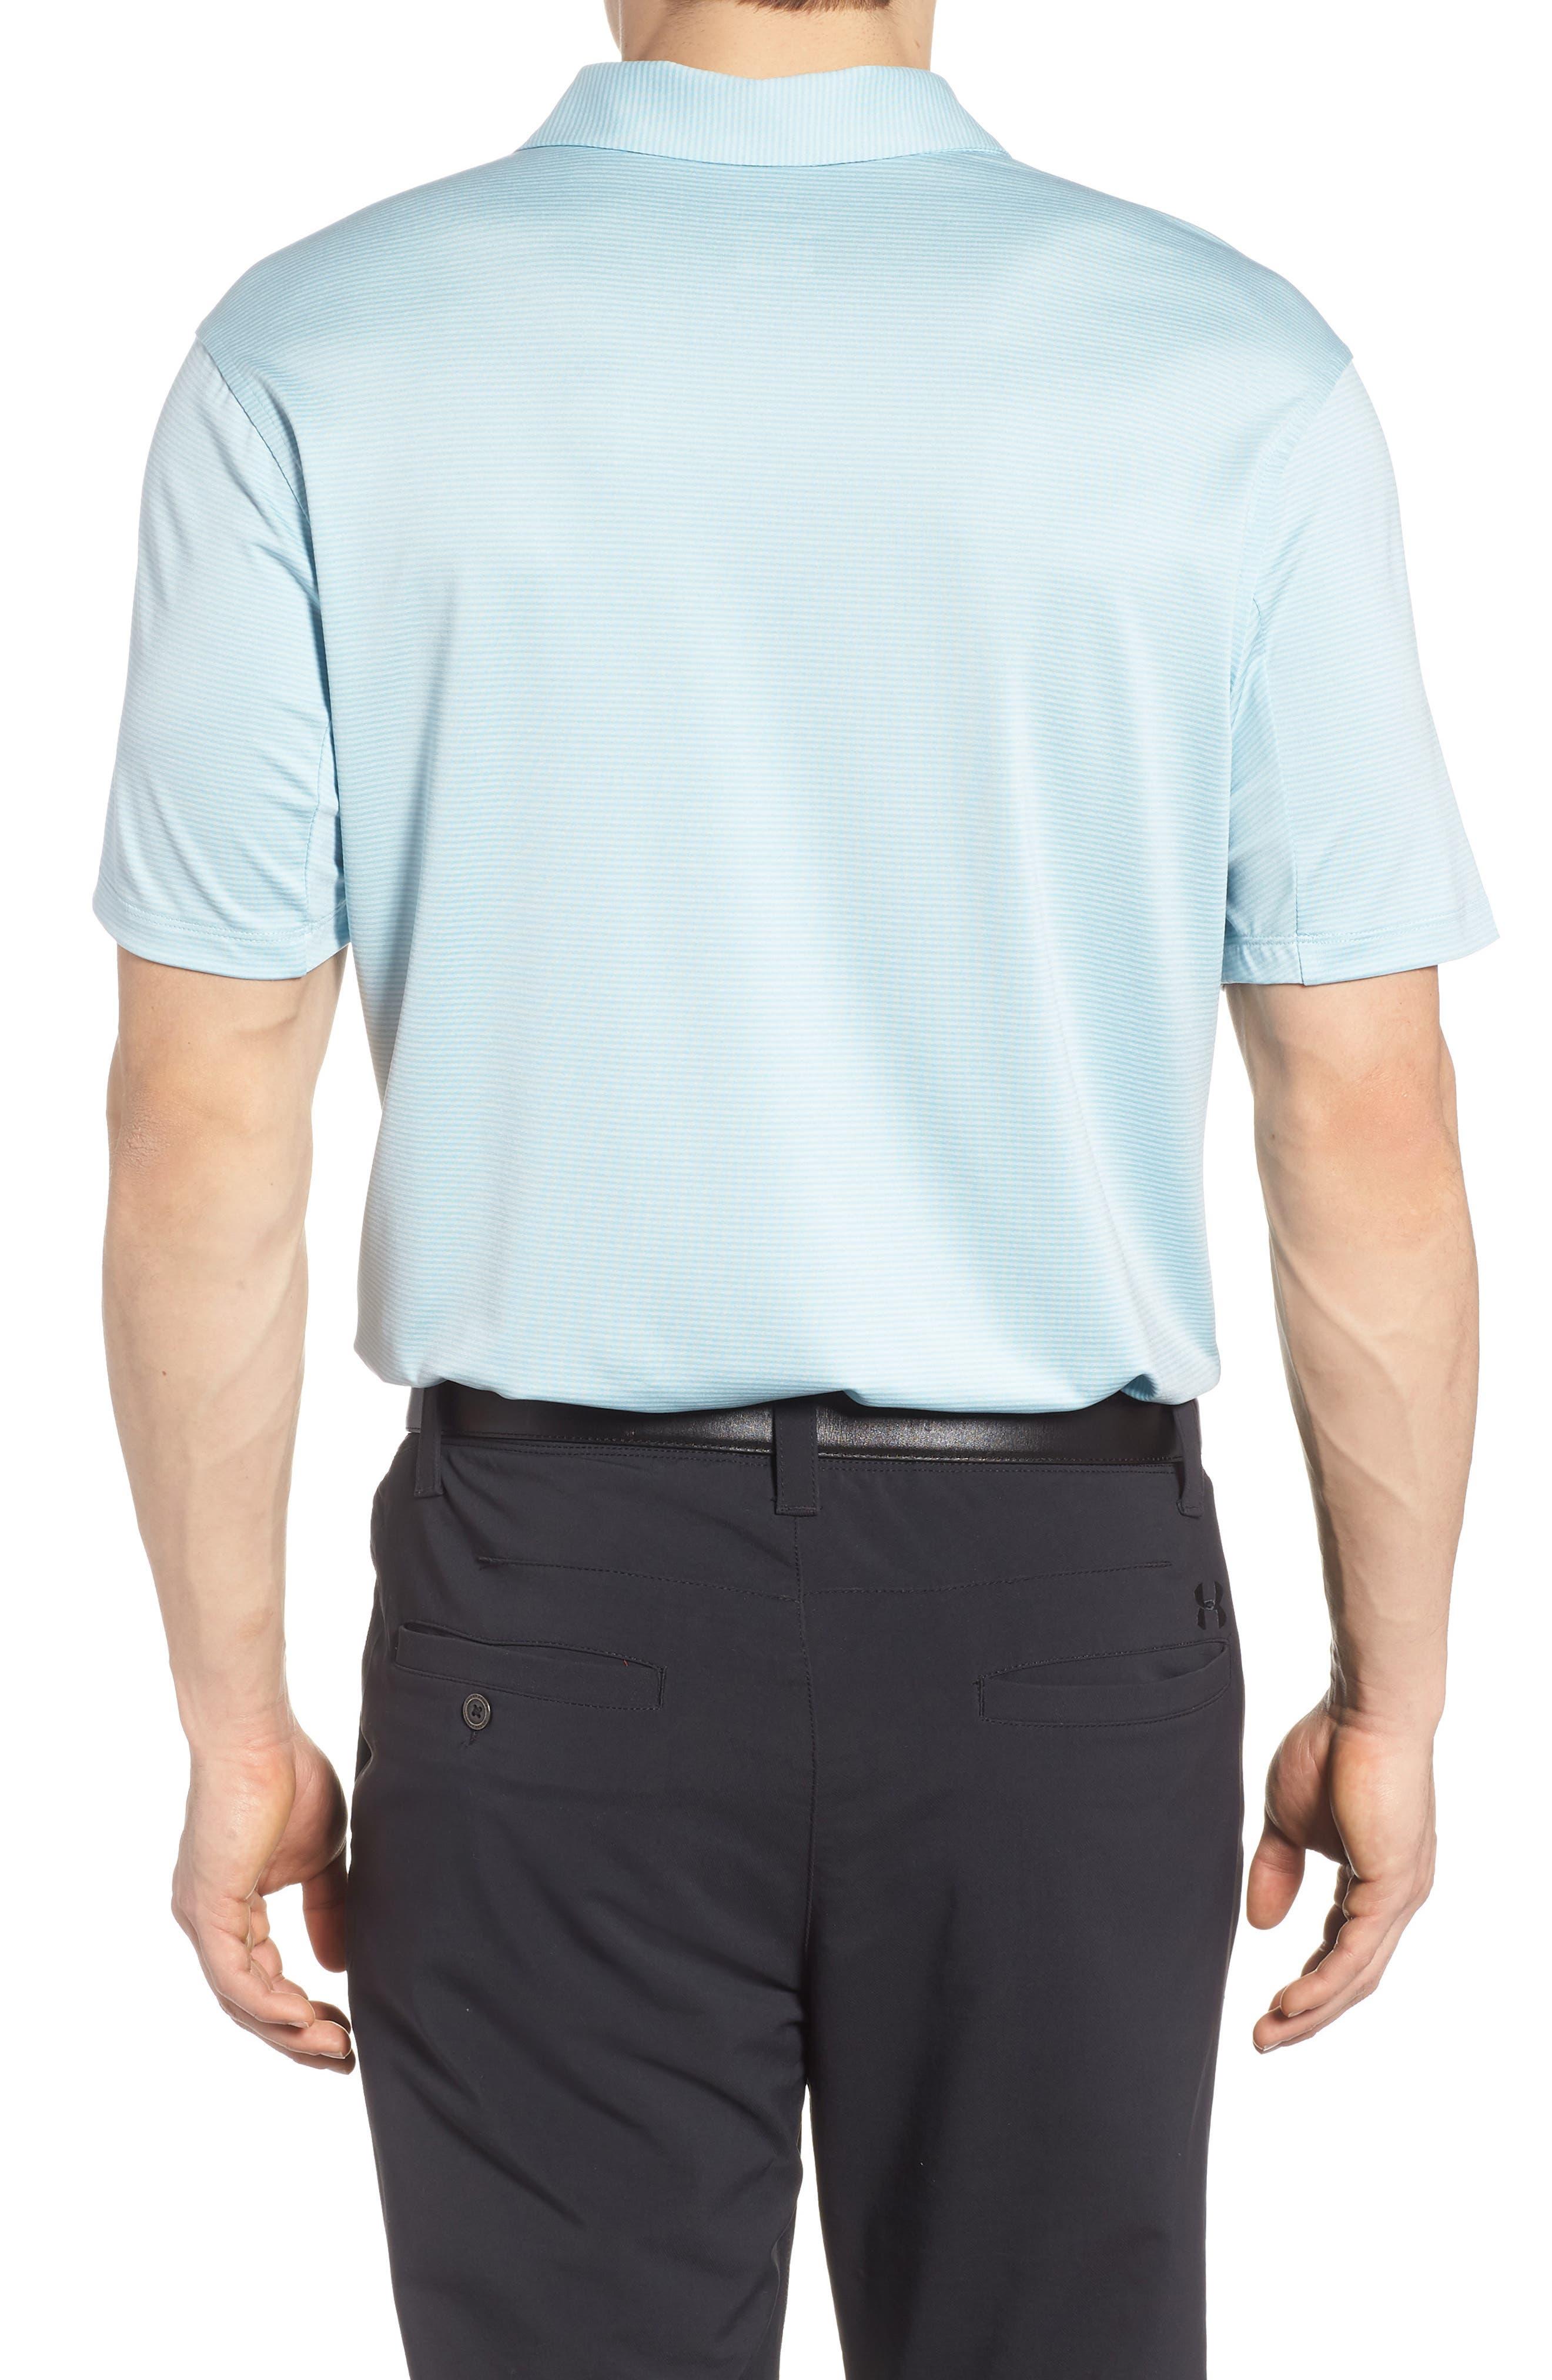 Dry Polo Shirt,                             Alternate thumbnail 2, color,                             OCEAN BLISS/ SILVER